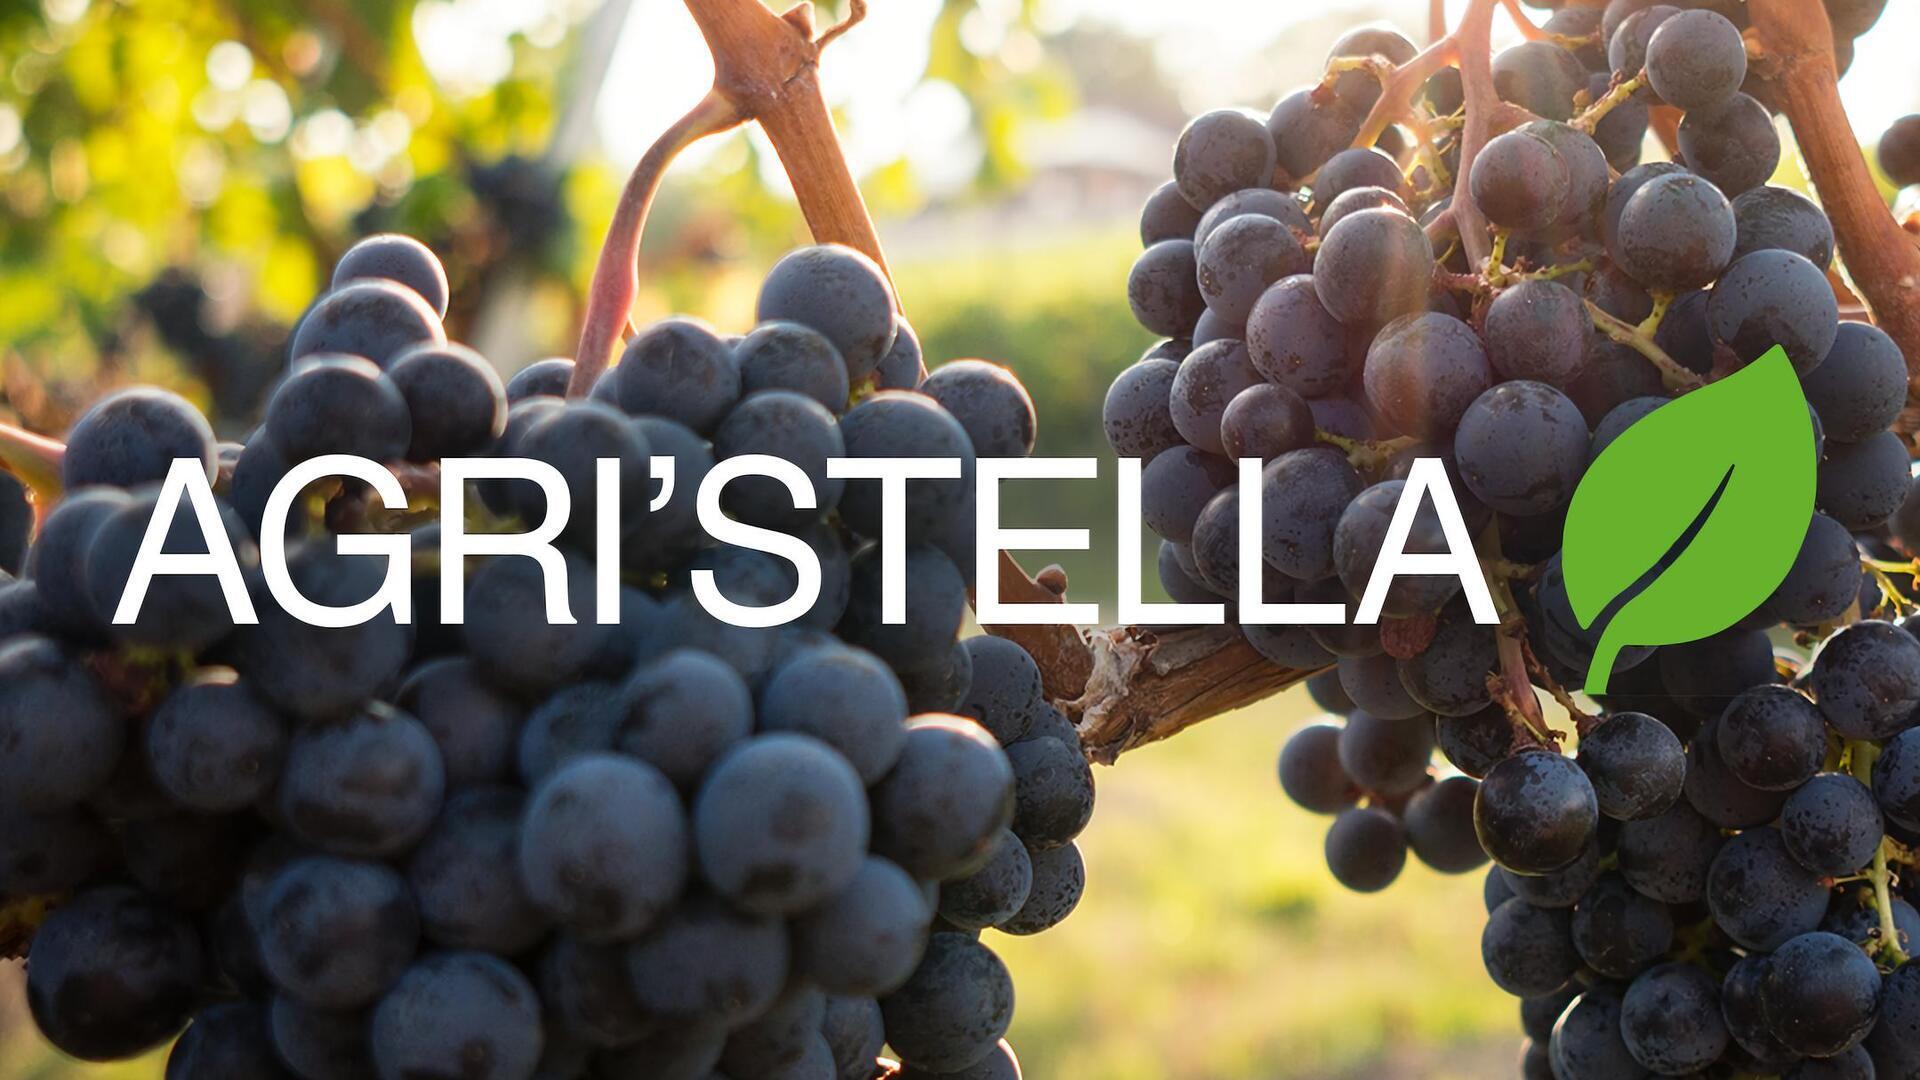 Agri'Stella : Soprappiù n°3, moments choisis et inédits